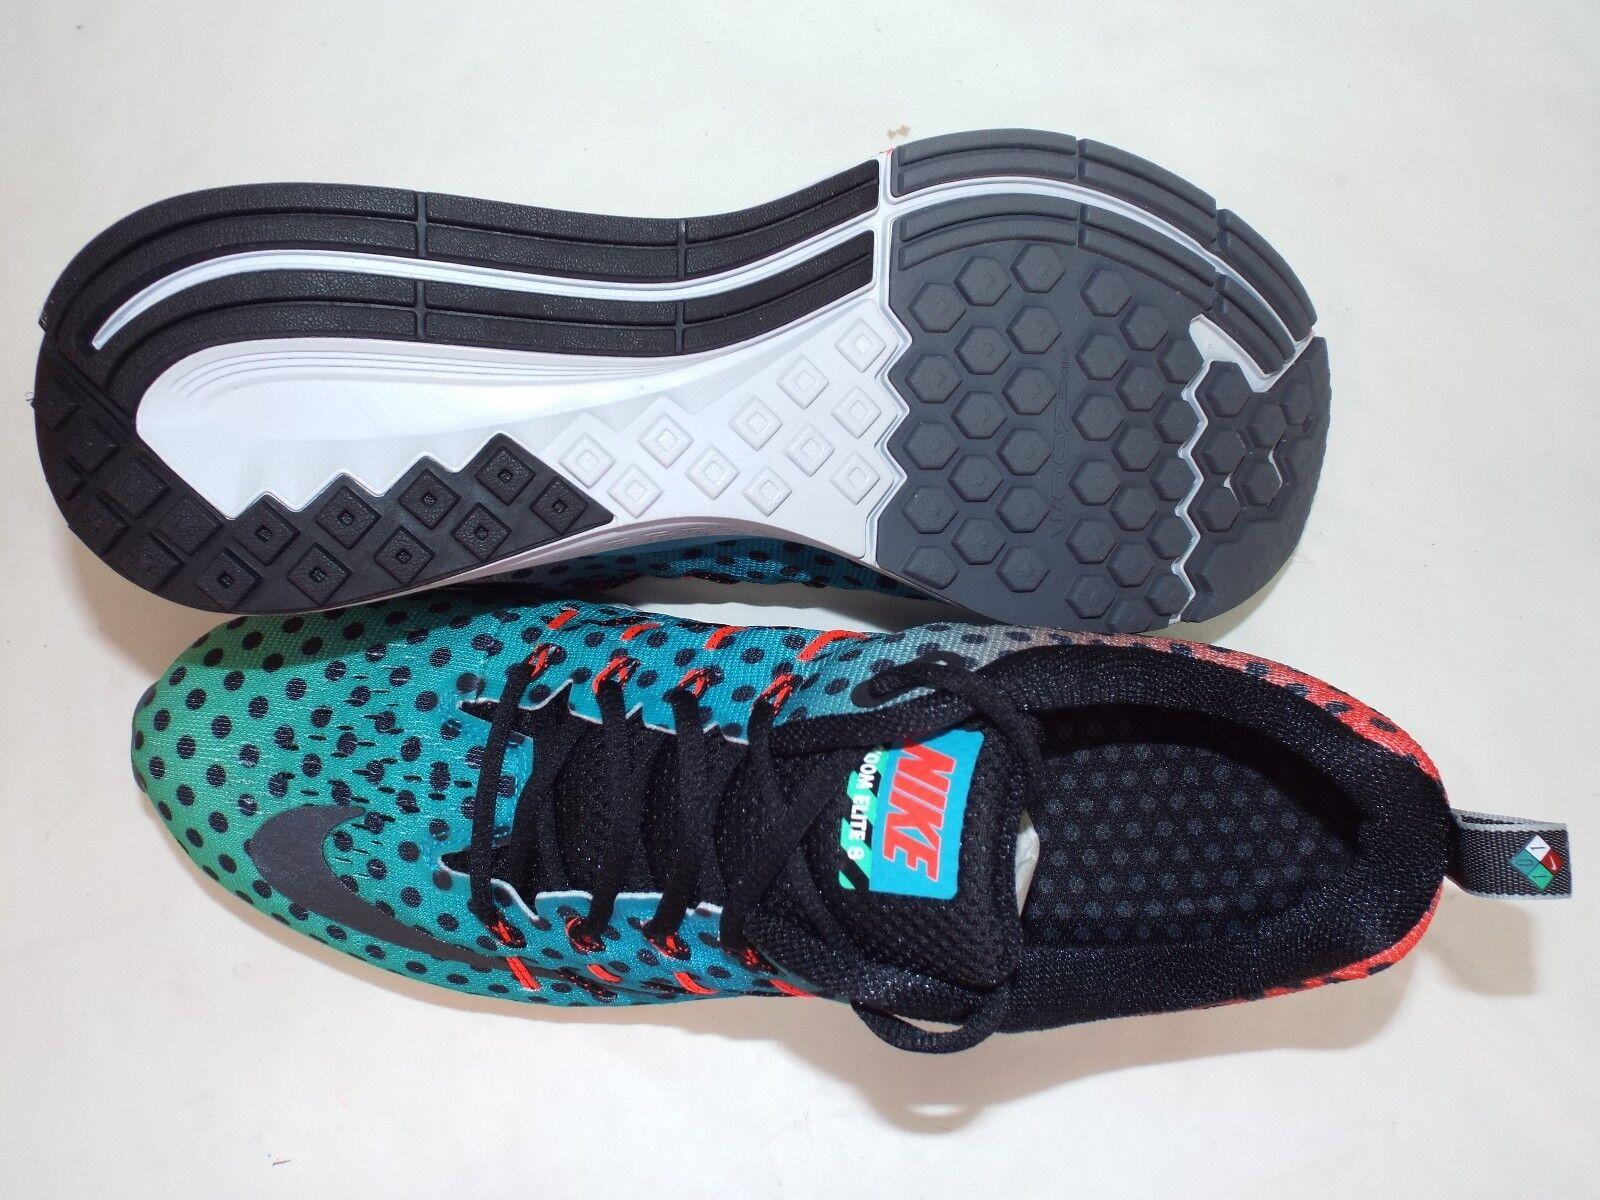 New Hommes 13 NIKE Air 8 Zoom Elite 8 Air 101 Bleu vert Chaussures  125 806537-001 506c16